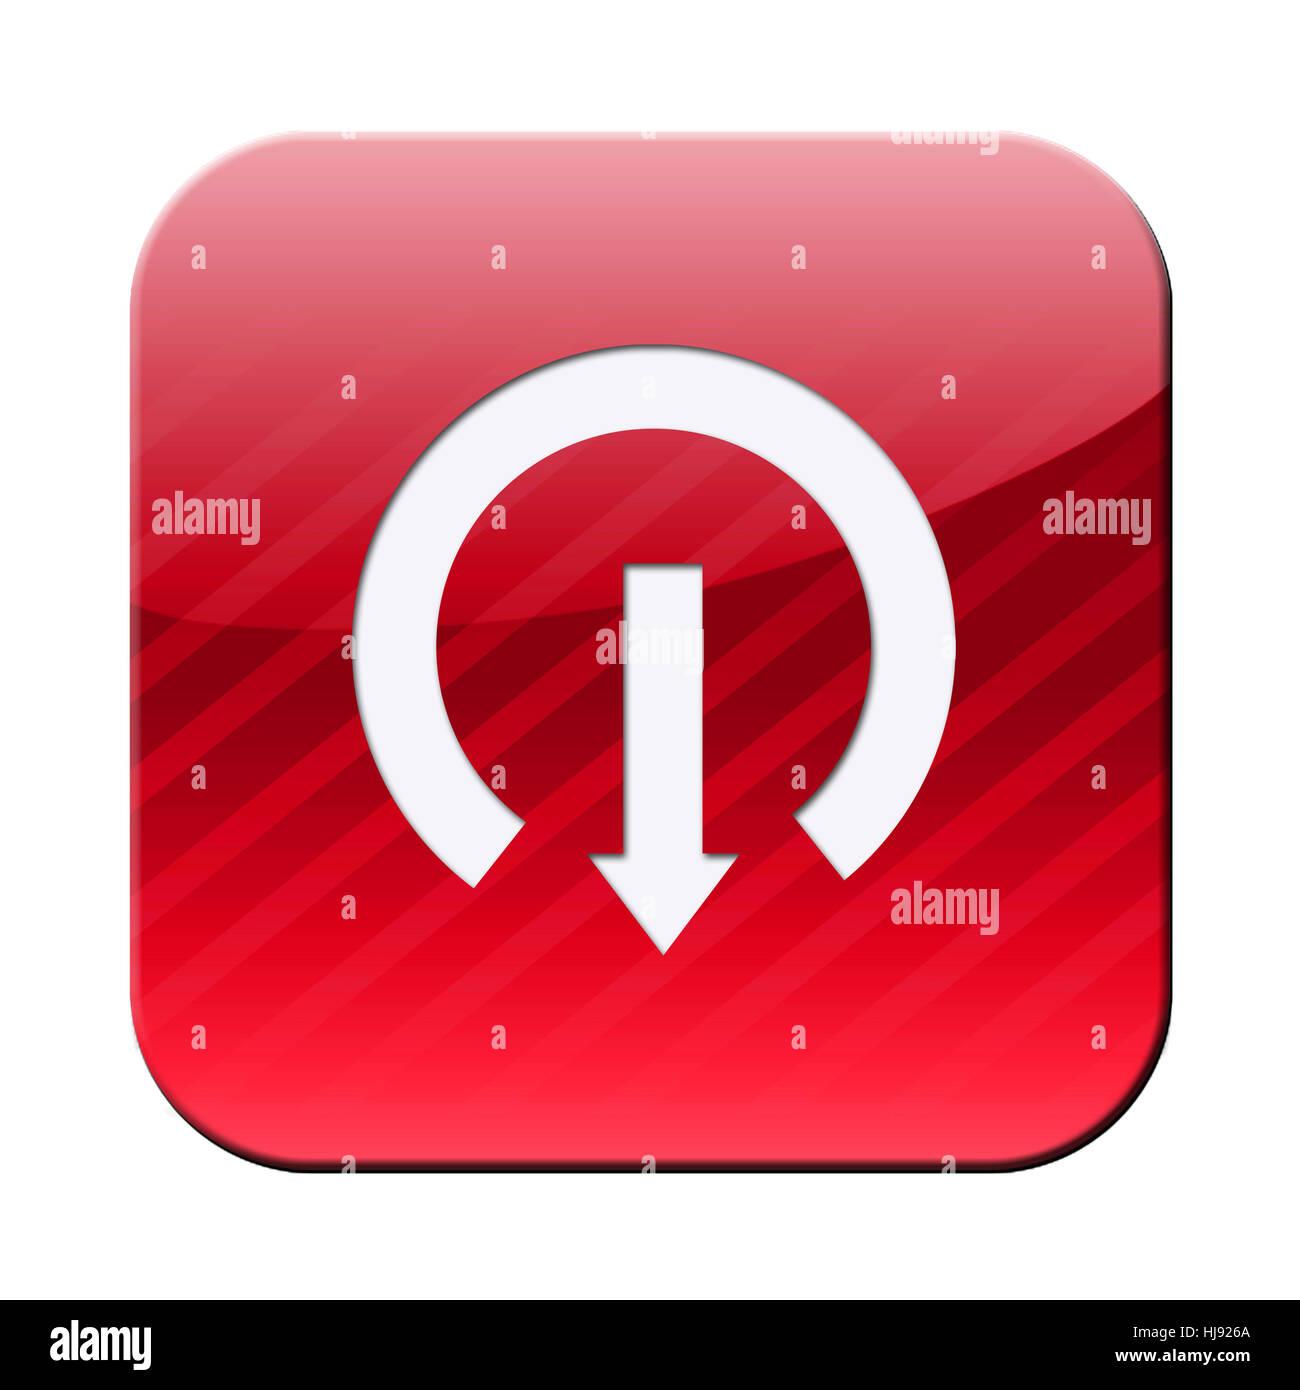 Login Logout button Stockfotografie   Alamy